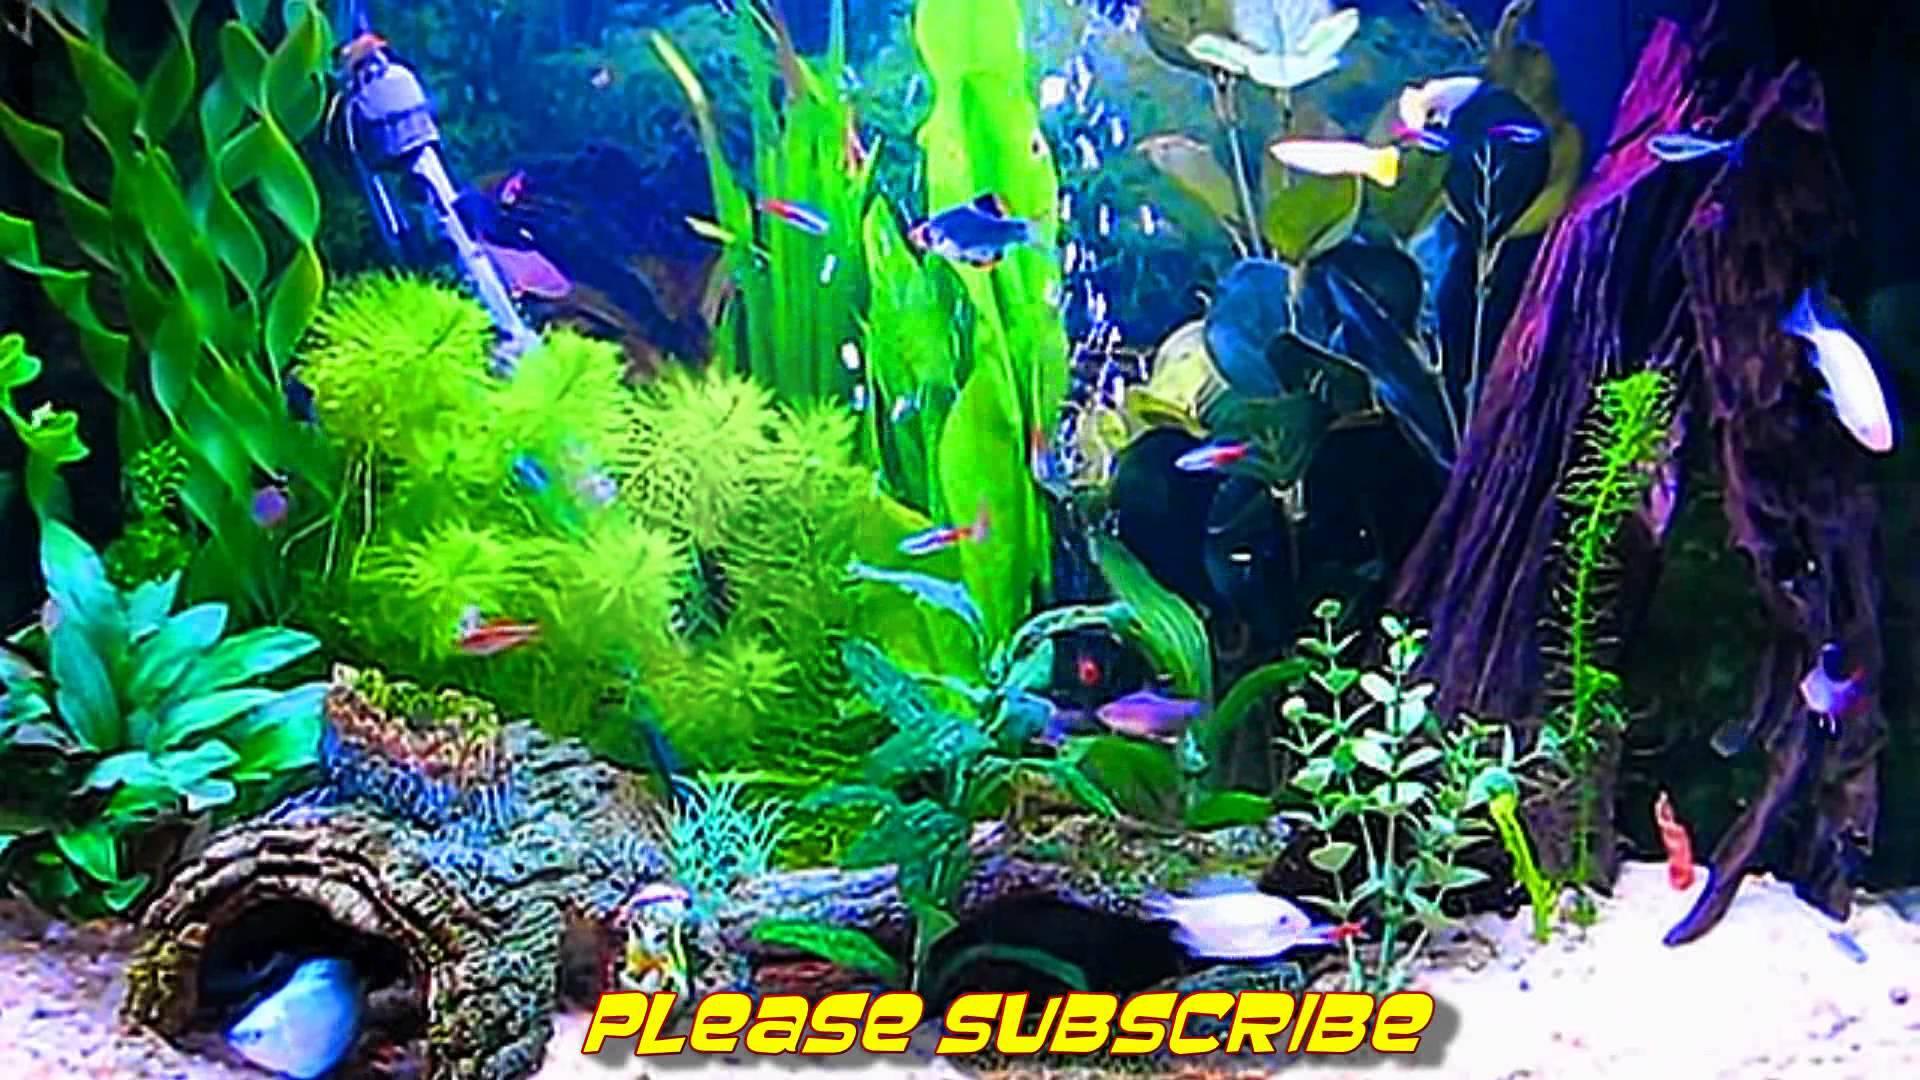 Amazing HD Aquarium ScreenSaver (Free) Windows and Android - YouTube